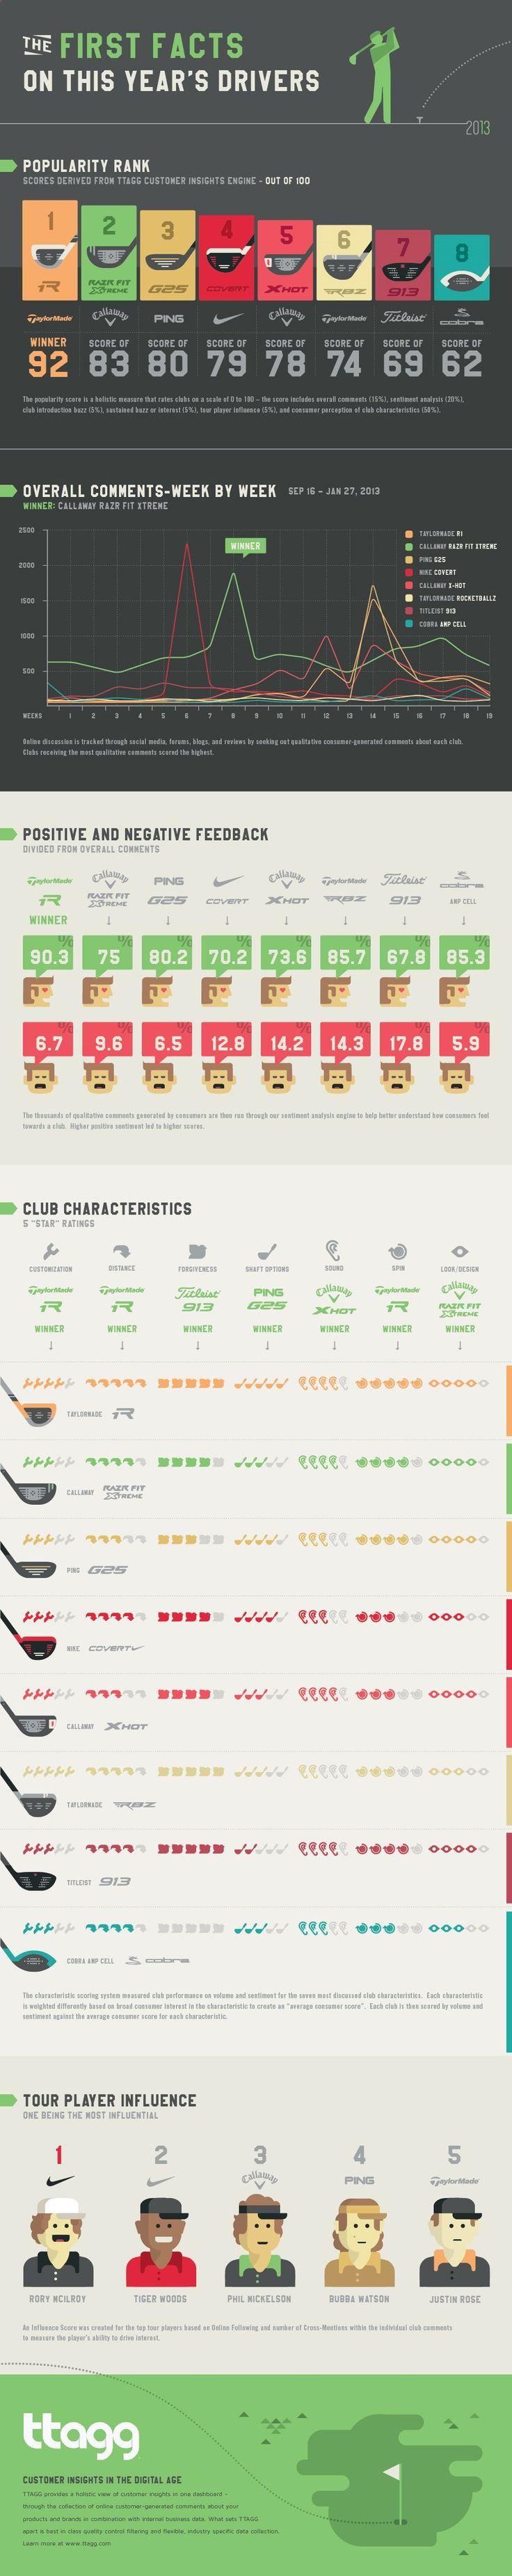 Golf Driver - Infografa sobre las principales marcas de Drivers. Ttagg-golf-infographic GolfDest / Golf Dest